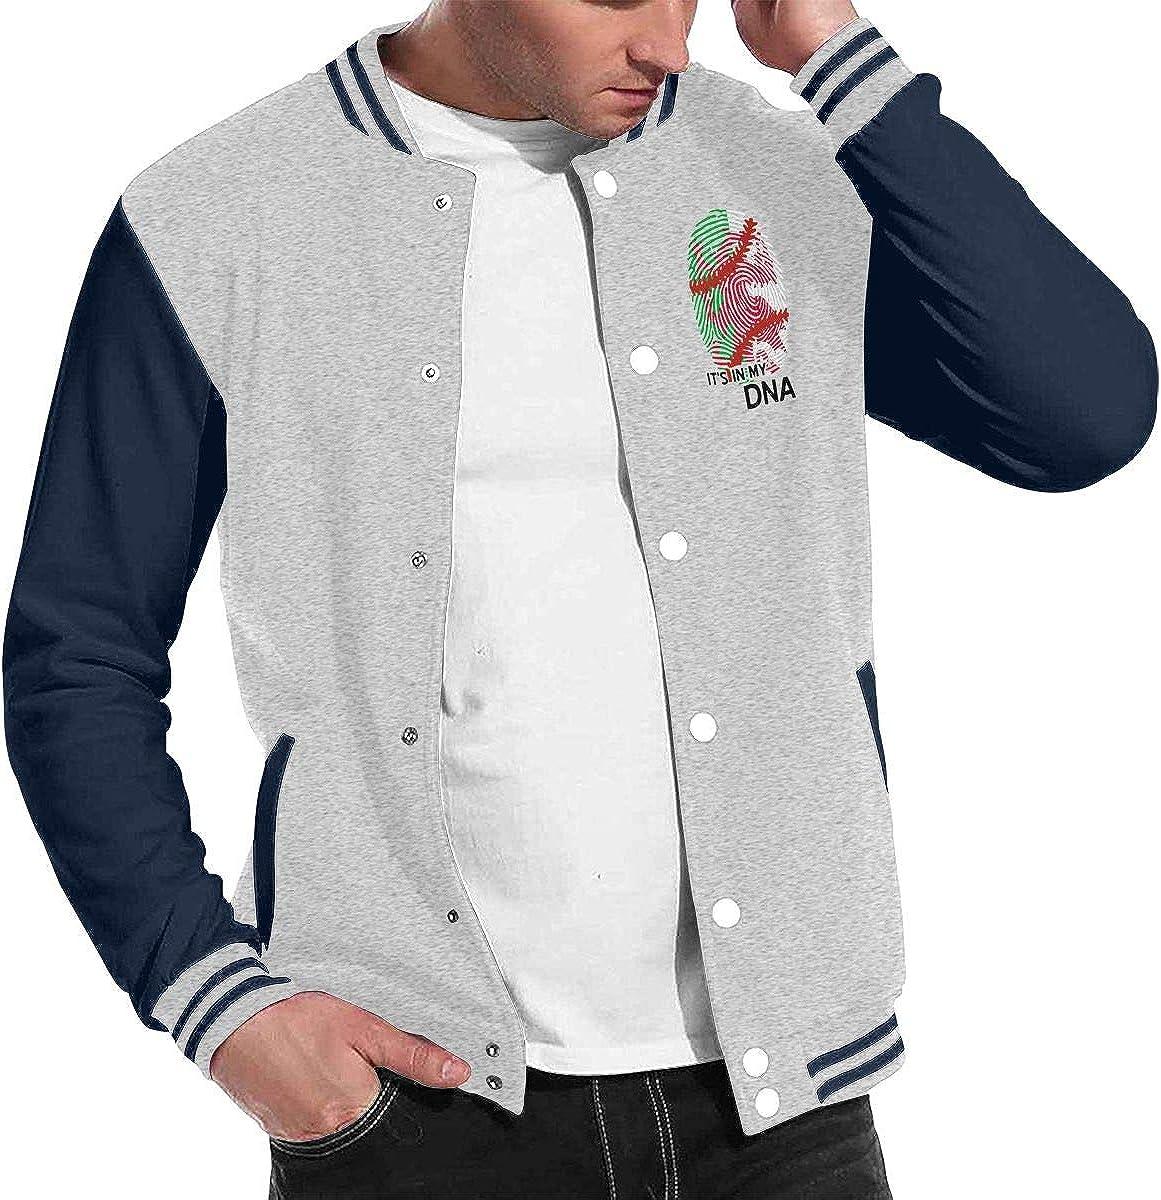 Men Women Varsity Premium Jacket Sweater Coat Wales Flag Baseball in My DNA Baseball Jacket Uniform